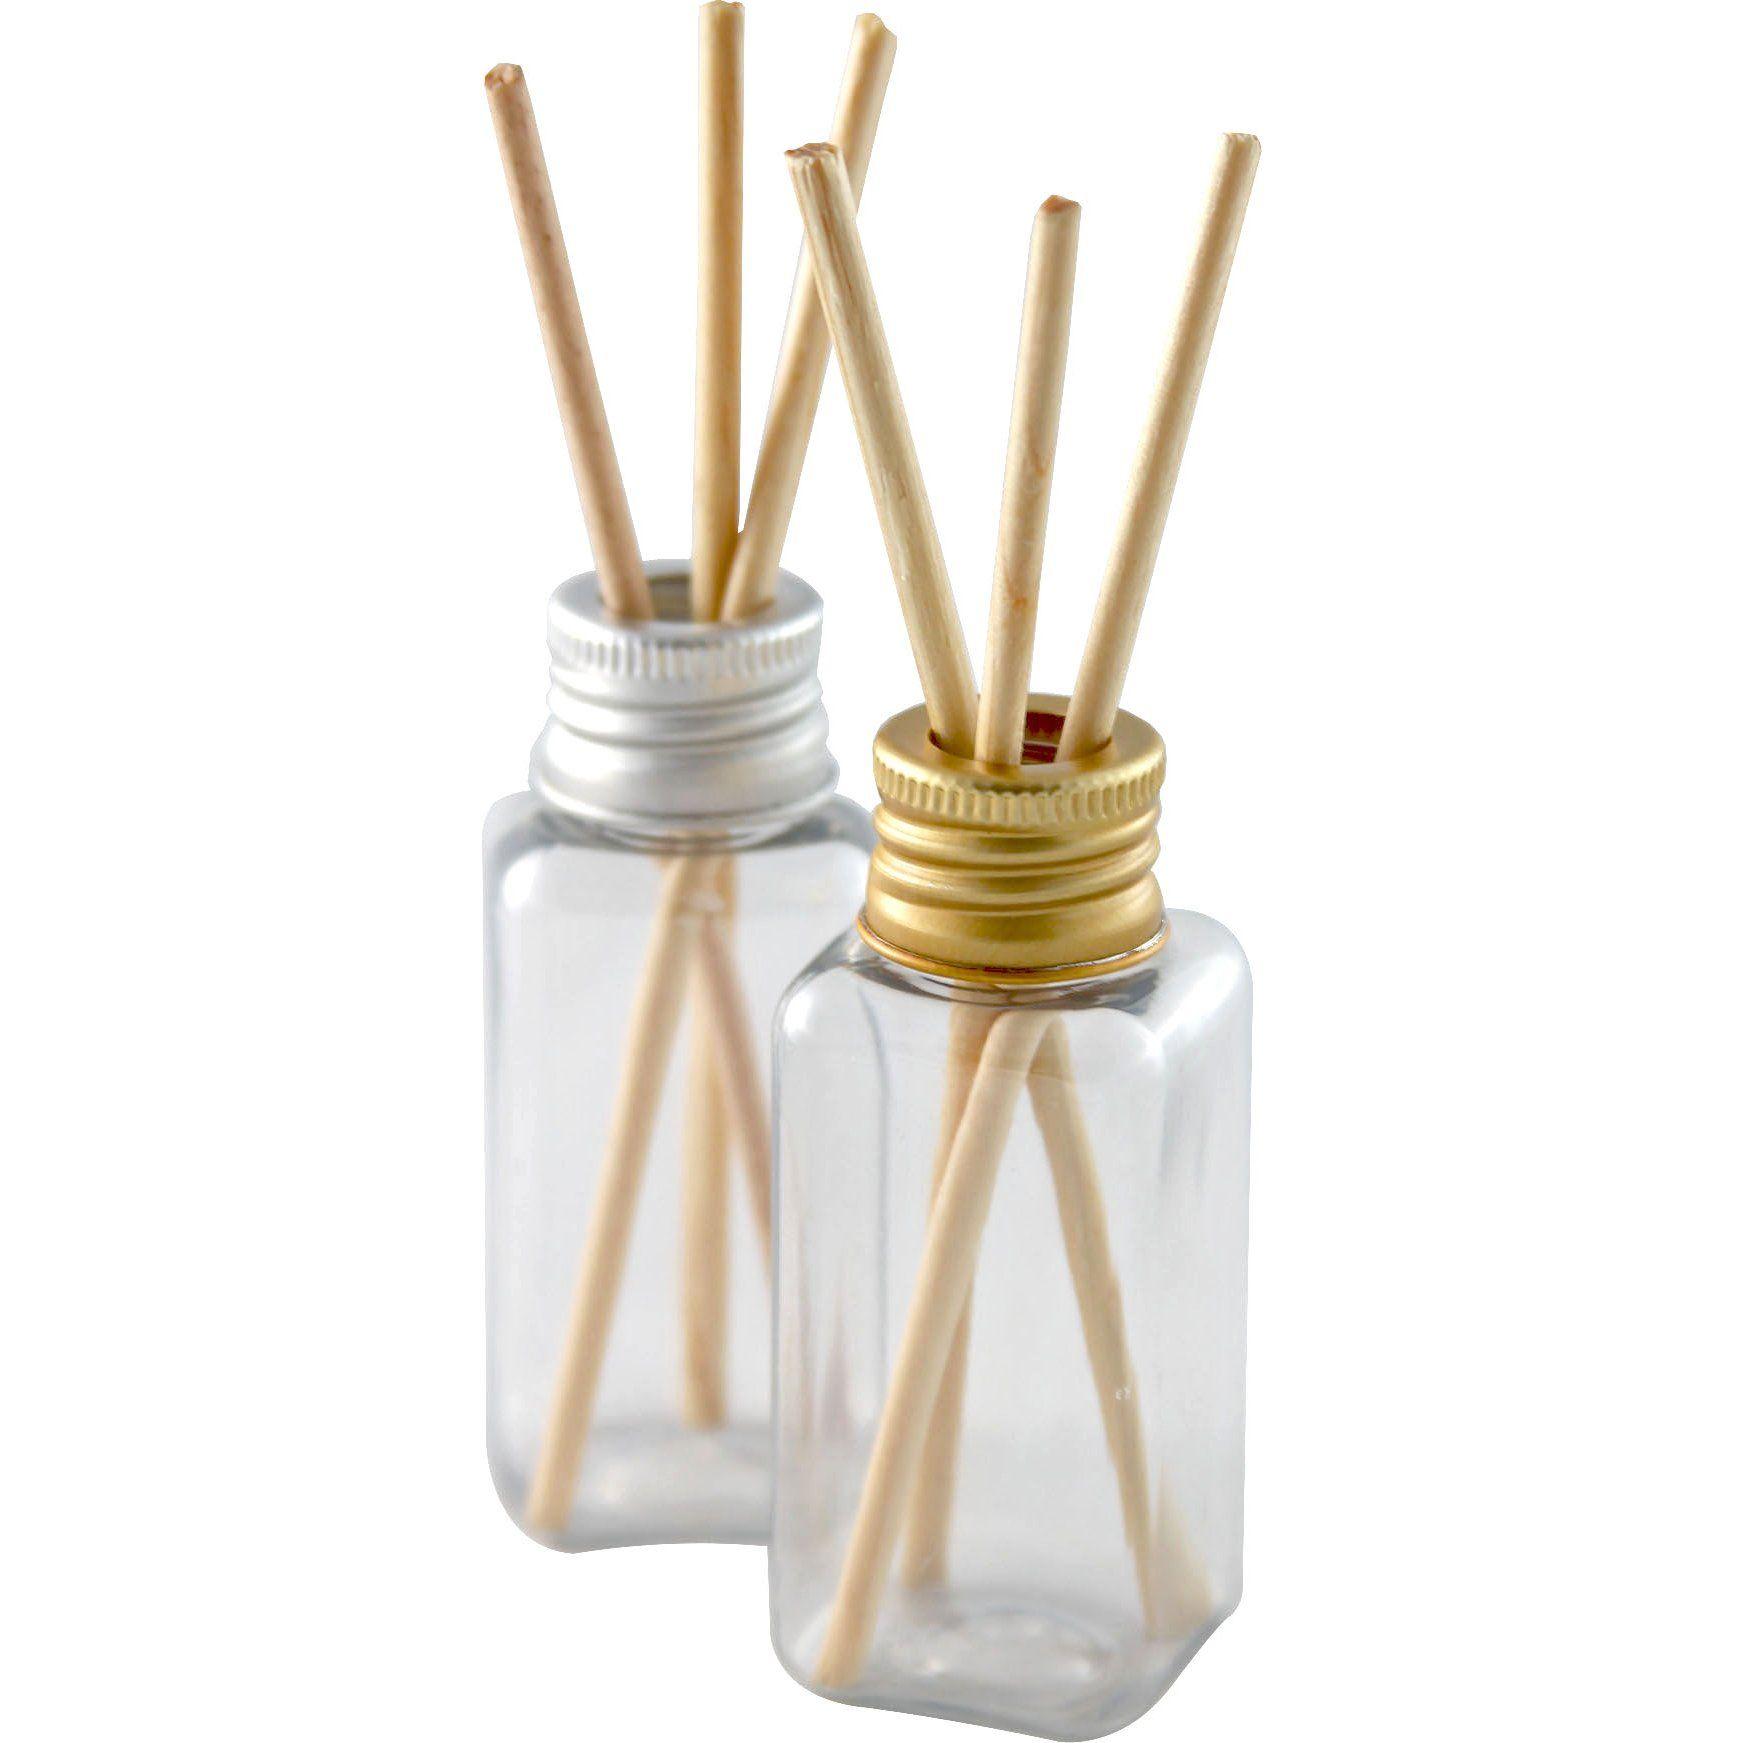 Frasco para Aromatizador Atacado Plástico de 40 ml kit com 100 unidades